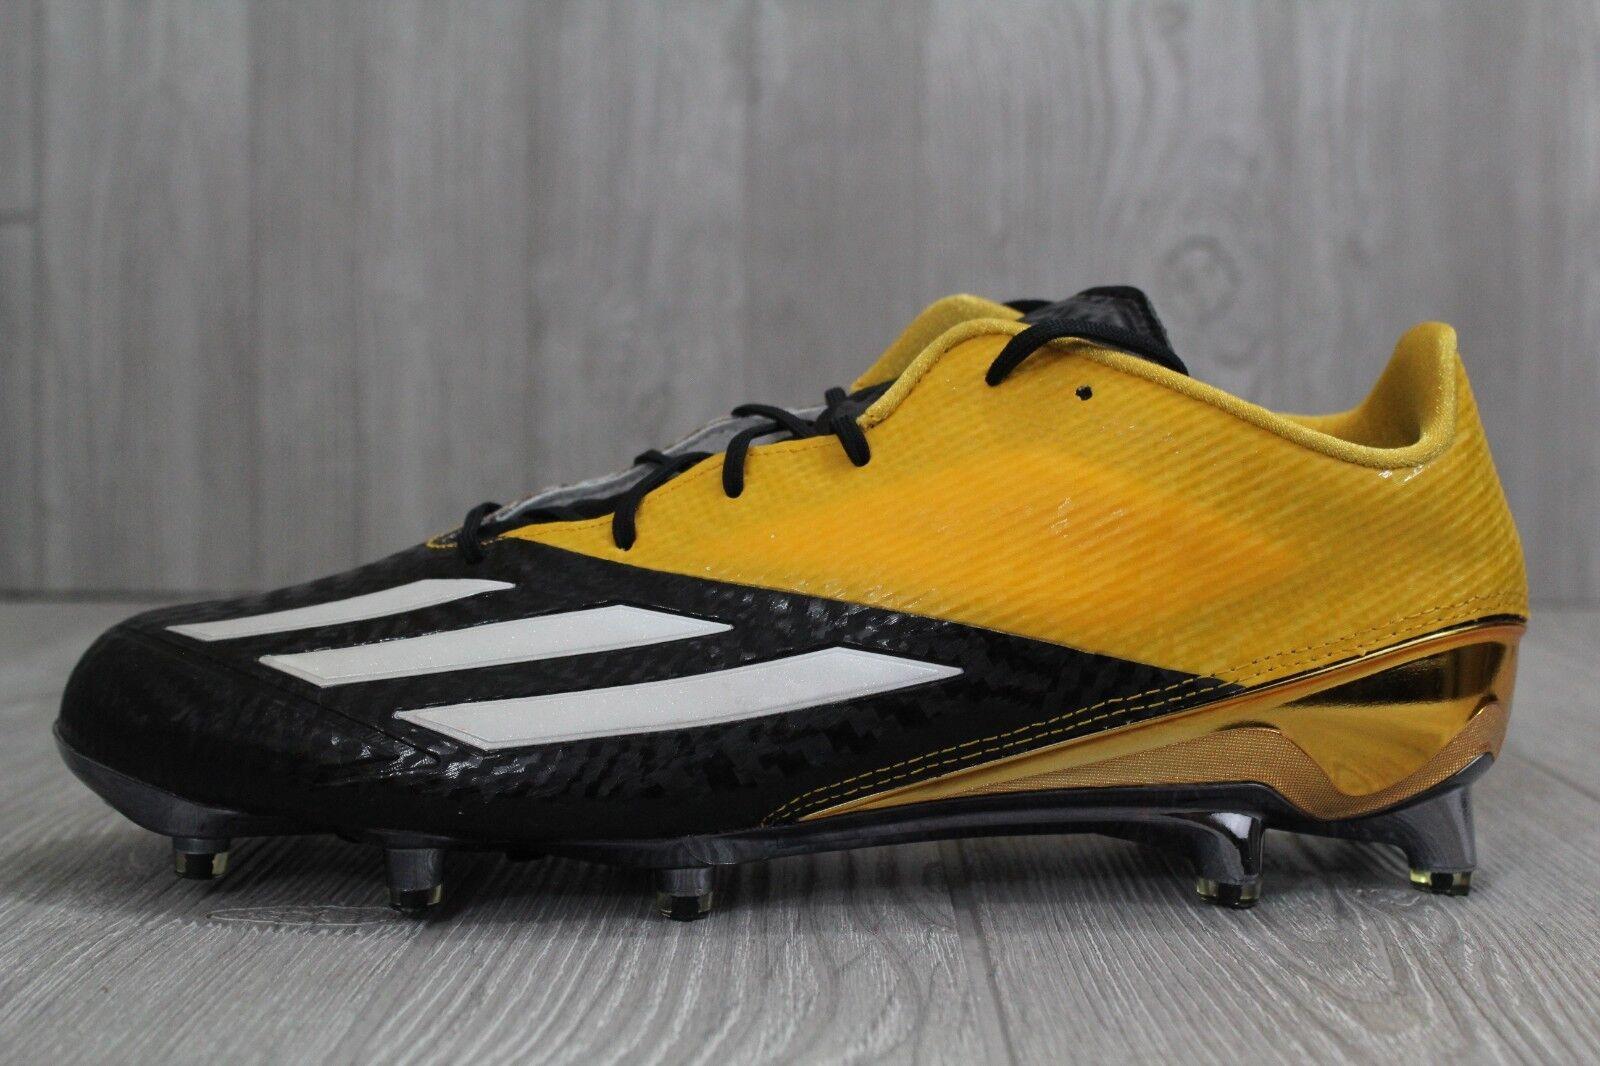 30 New Adidas AdiZero Star 5.0 Football Cleats Black Yellow Men's 11 12.5 AQ7173